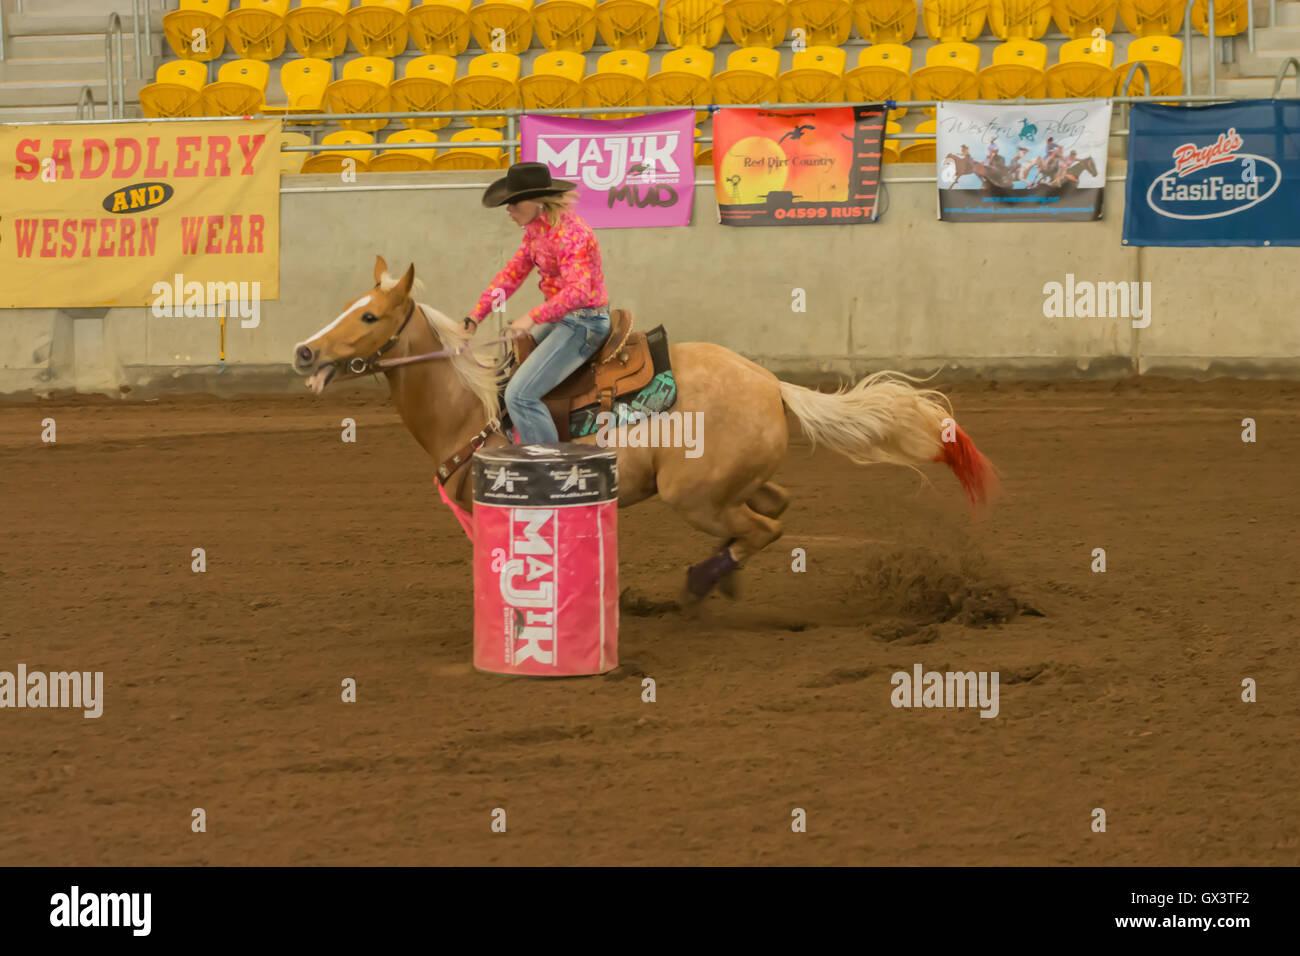 Cowgirl Barrel Racing At An Indoor Arena Tamworth Australia Stock Photo Alamy